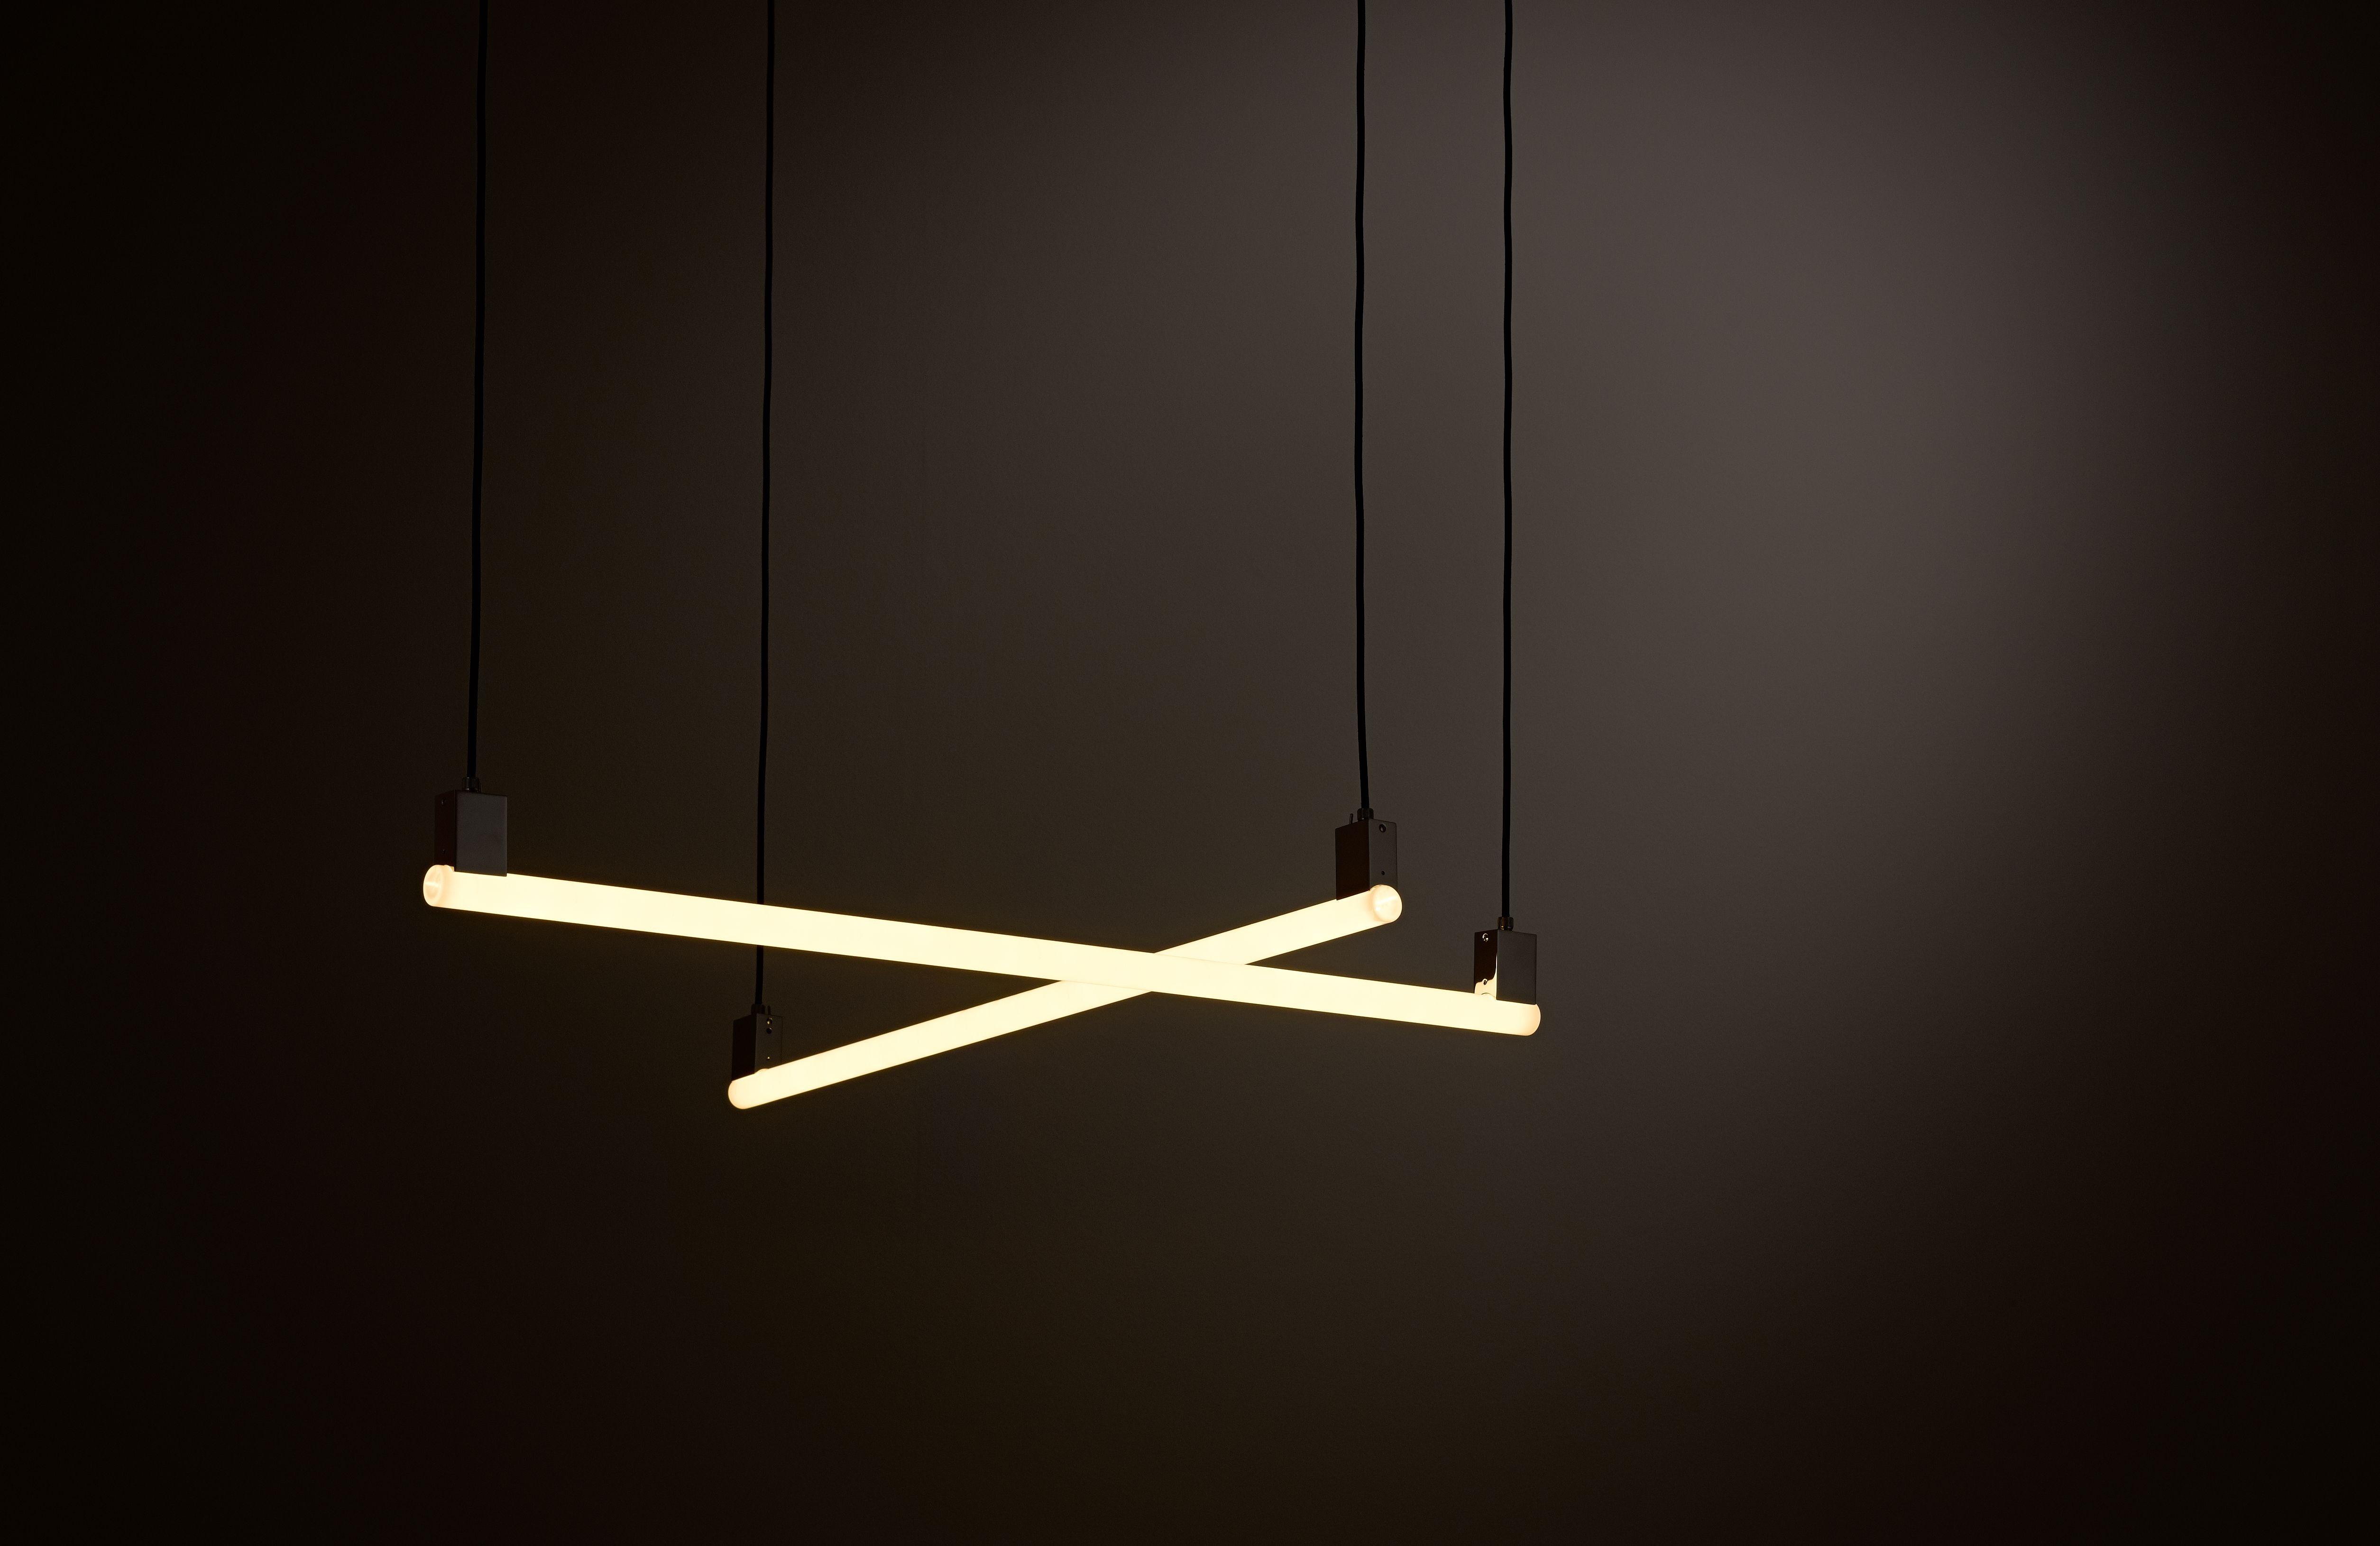 Lighting & MEA suspensions | prodotti | Pinterest | Lighting azcodes.com